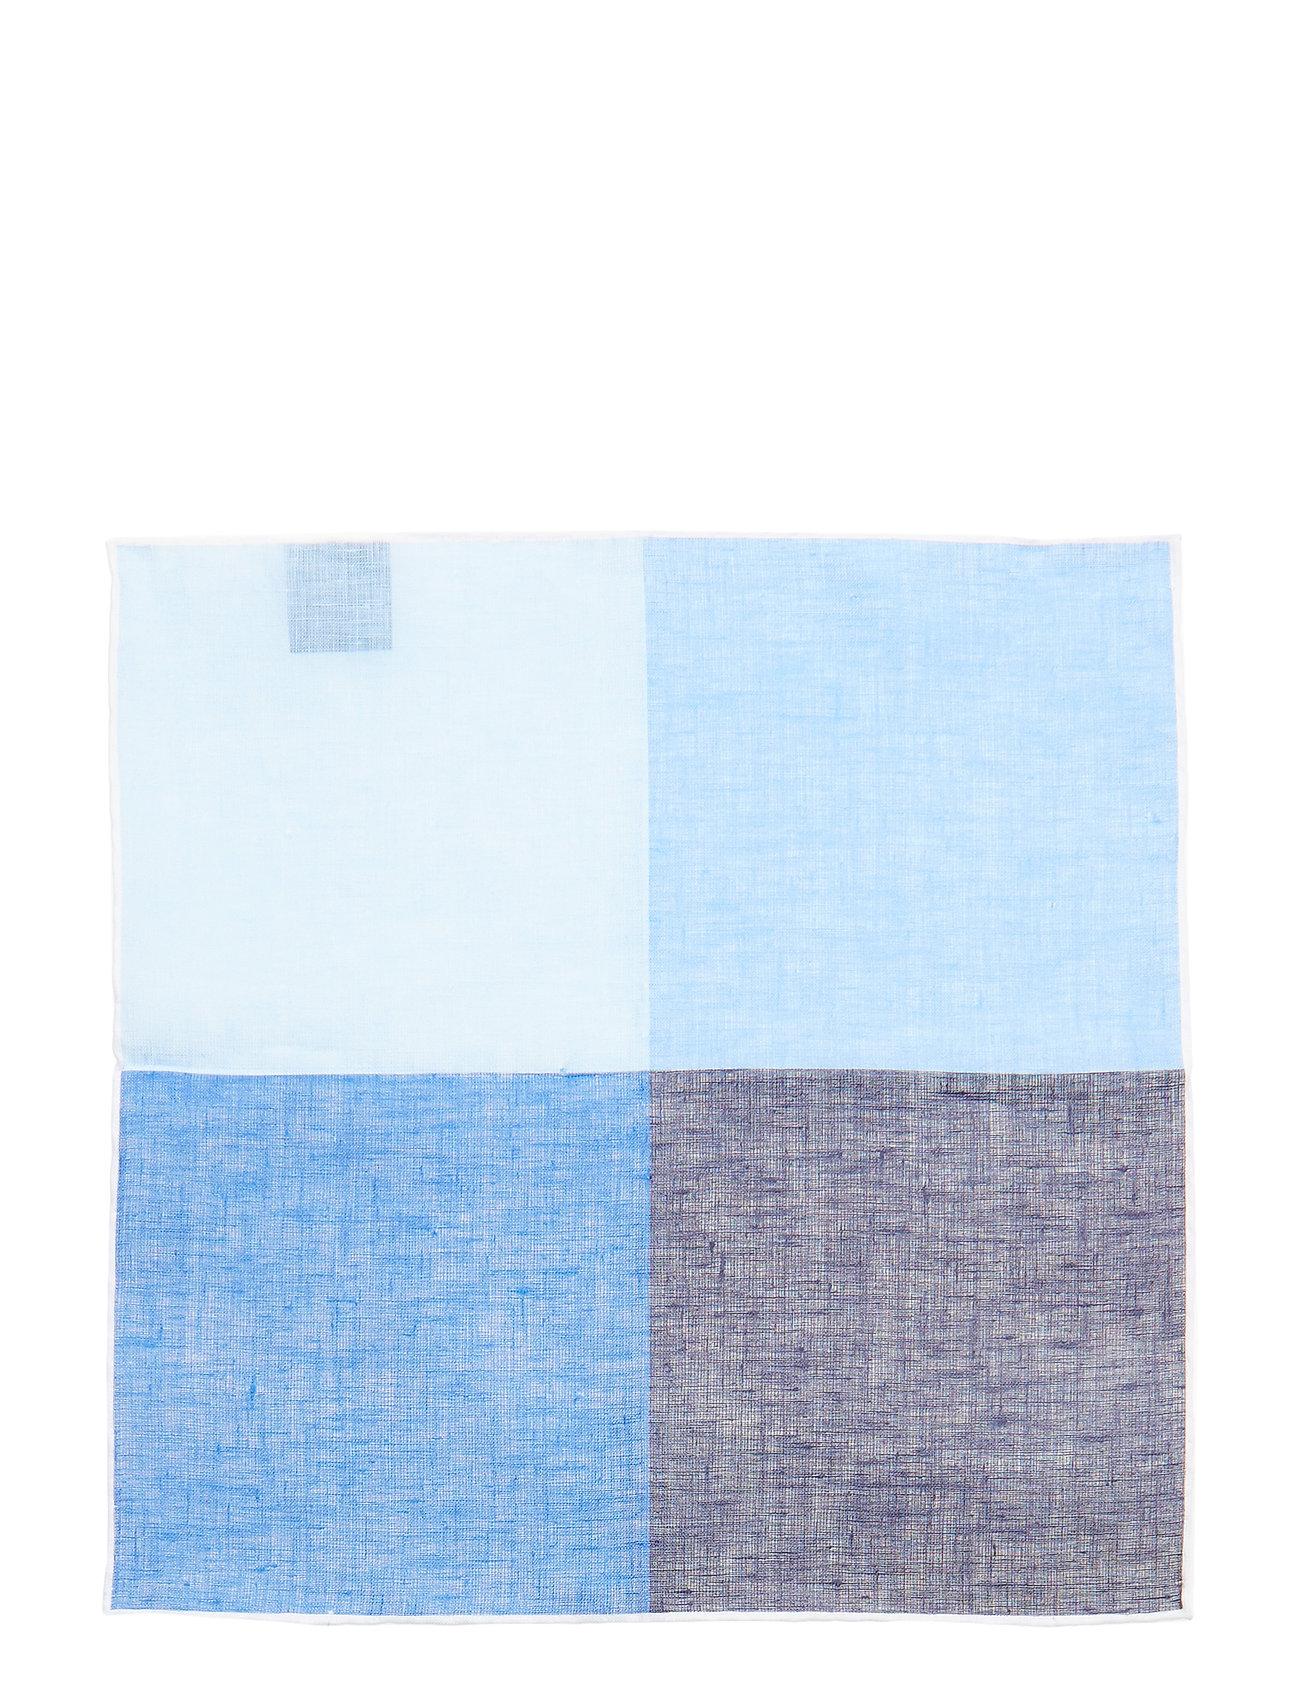 Printed Pocket Square Brystlommetørklæde Blå AMANDA CHRISTENSEN